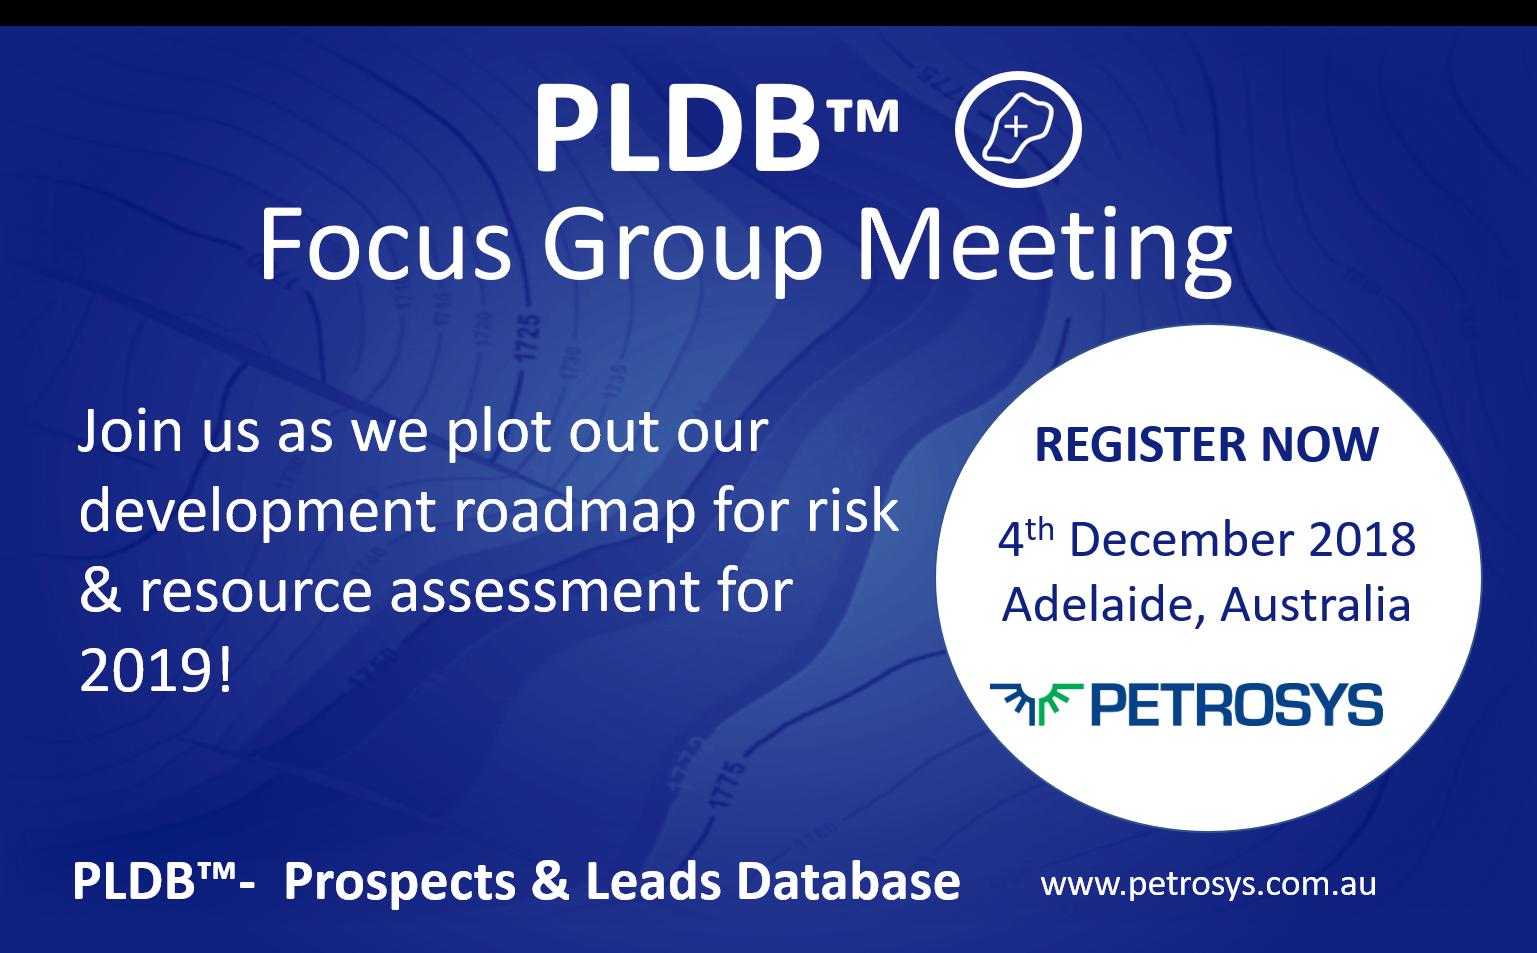 PLDB Focus Group Meeting